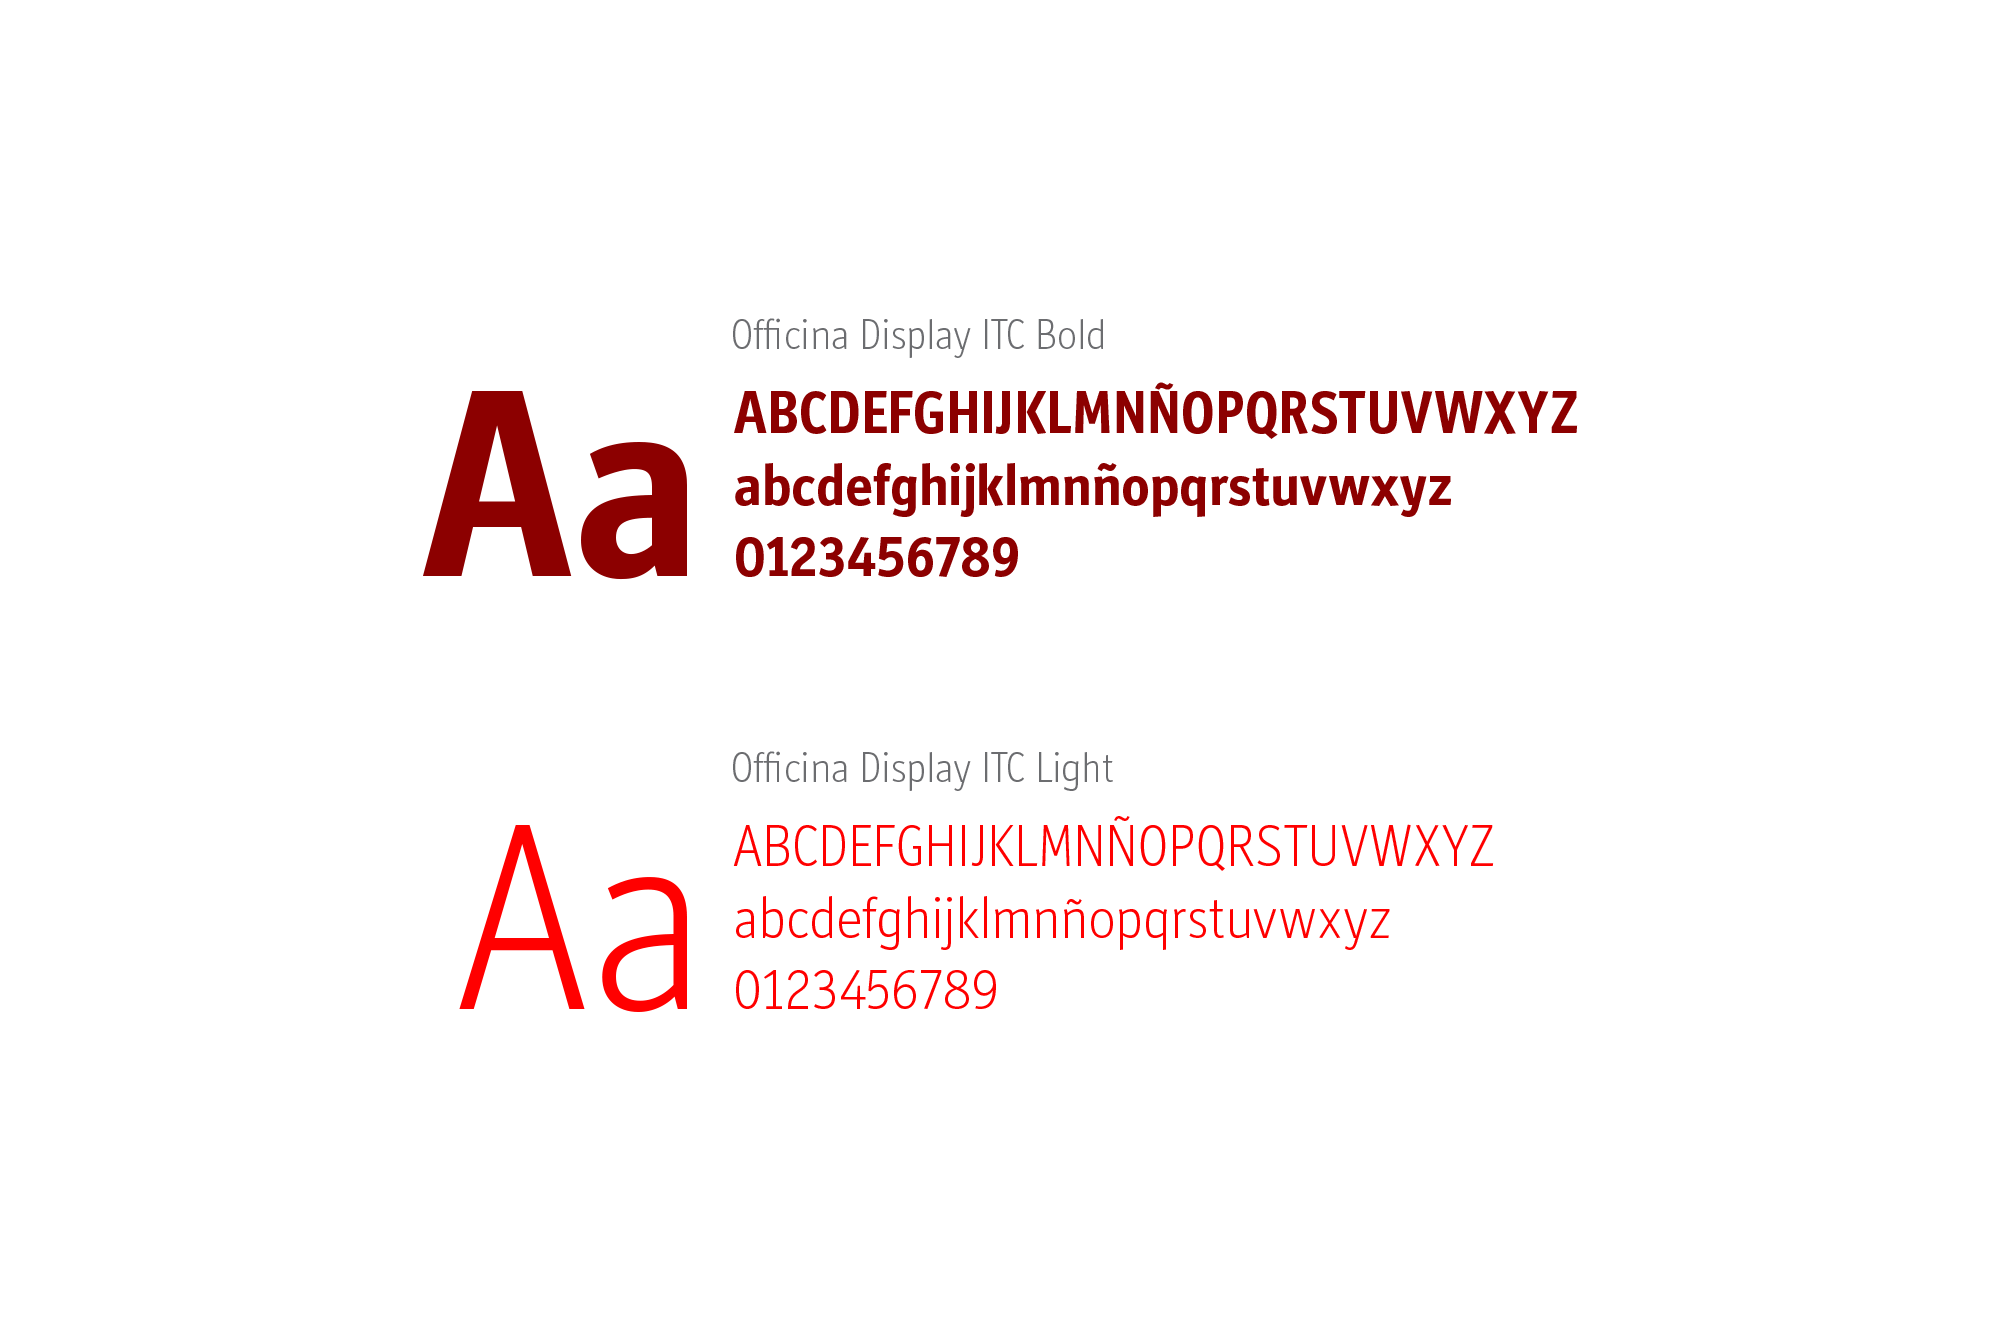 raniev-rod-alvarez-diseño-gráfico-queretaro-iqbit-10-typography